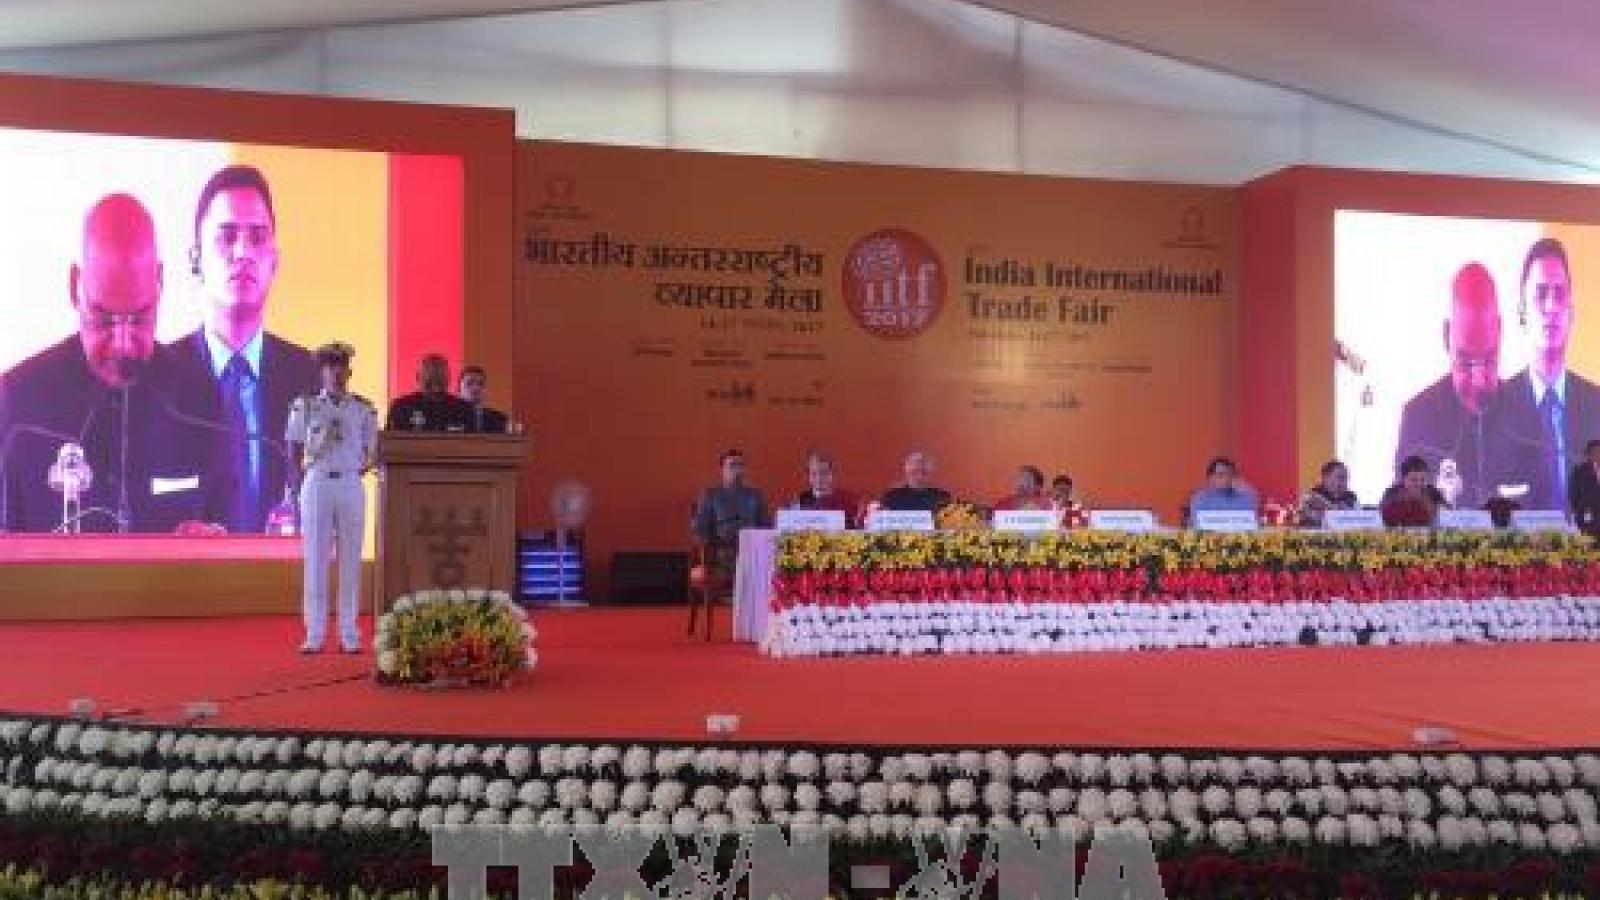 Vietnam attends India international trade fair